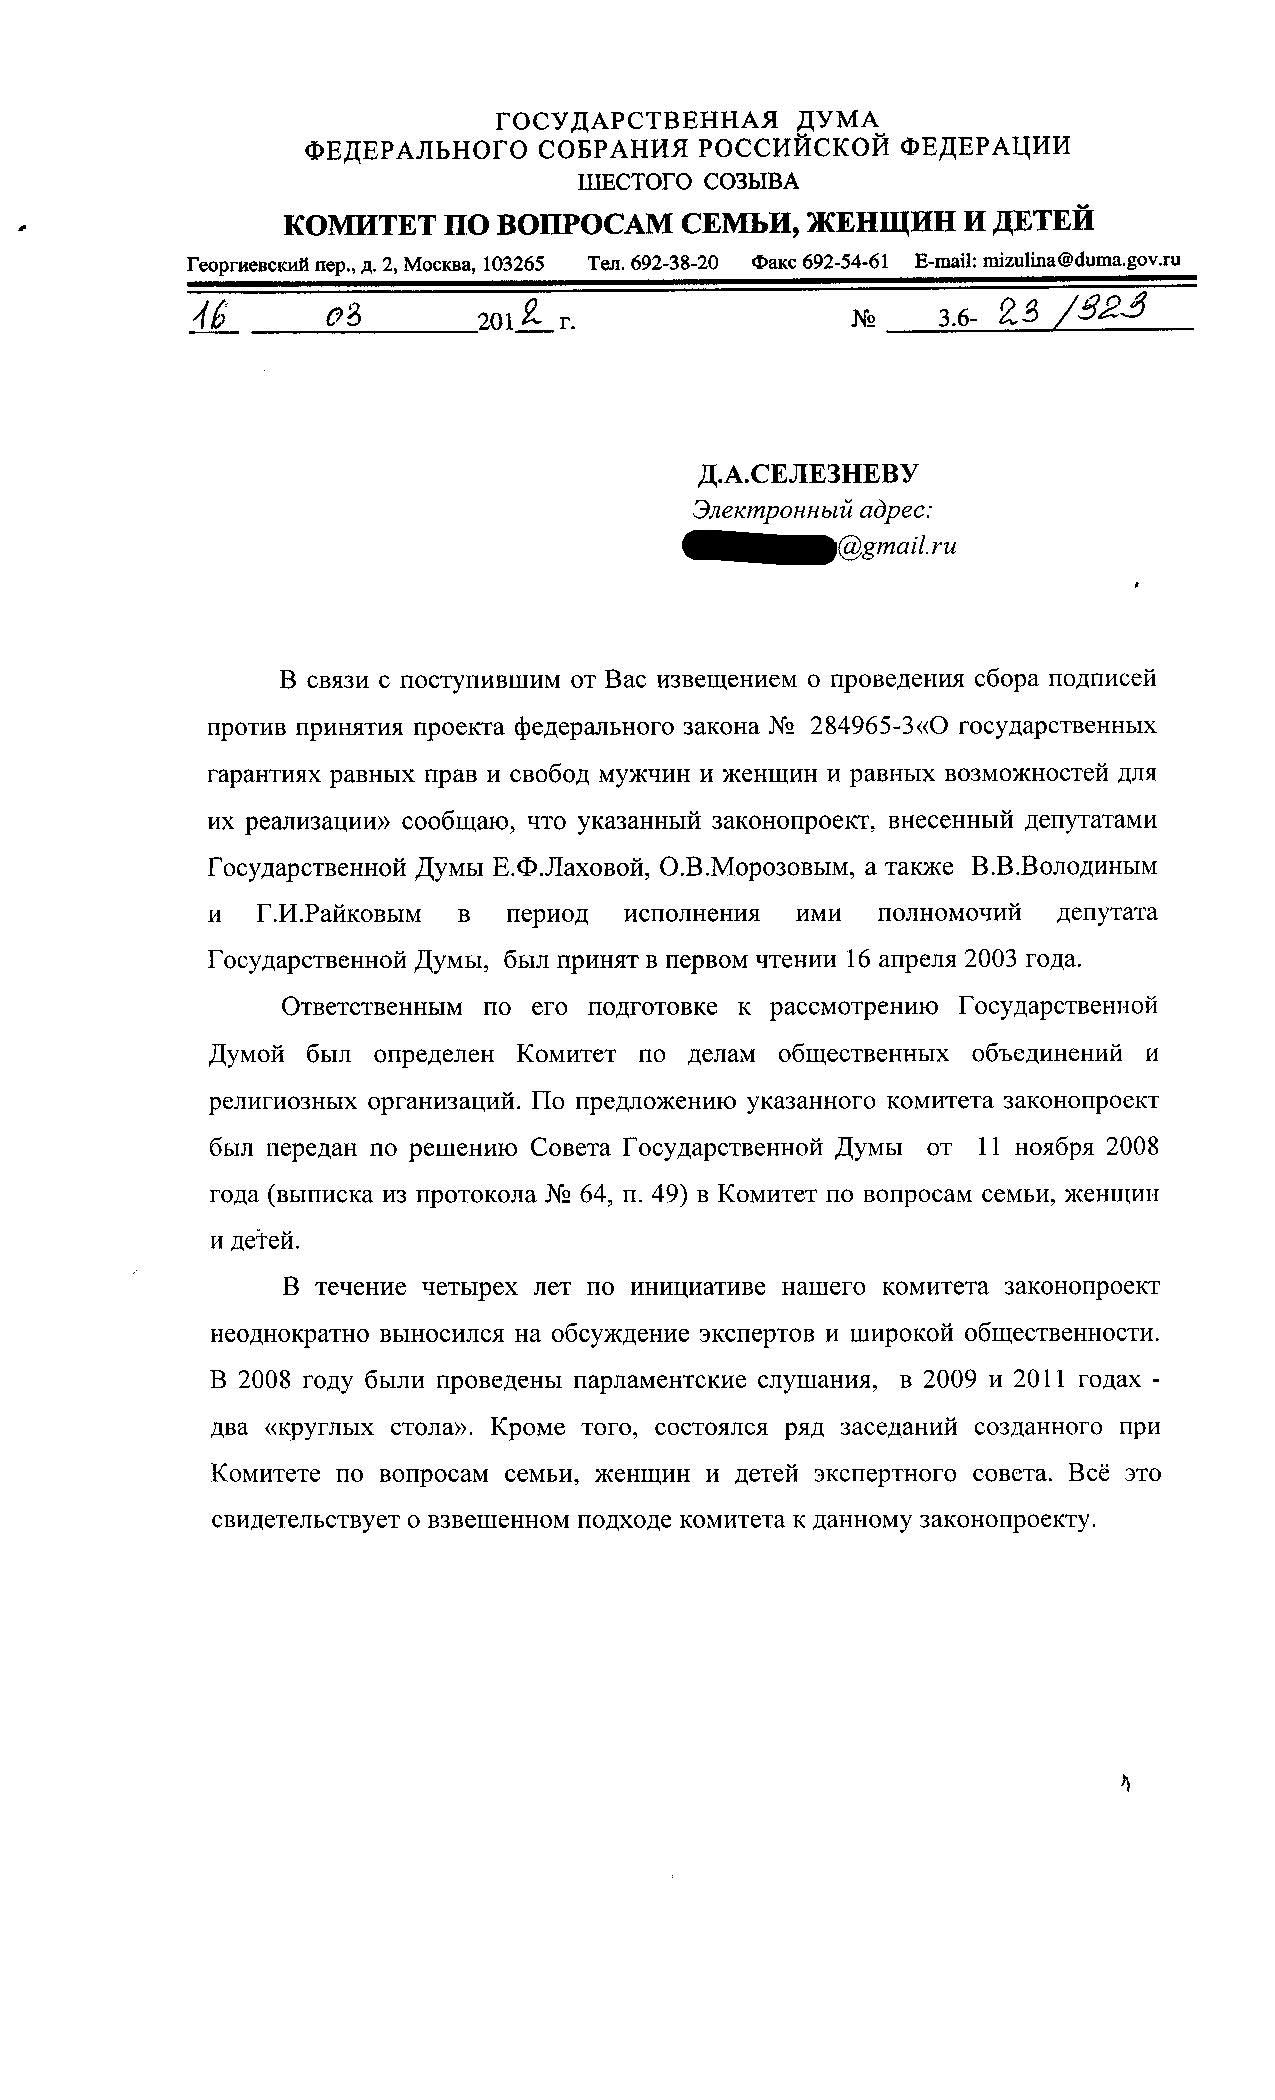 Mizulina_letter_gender01